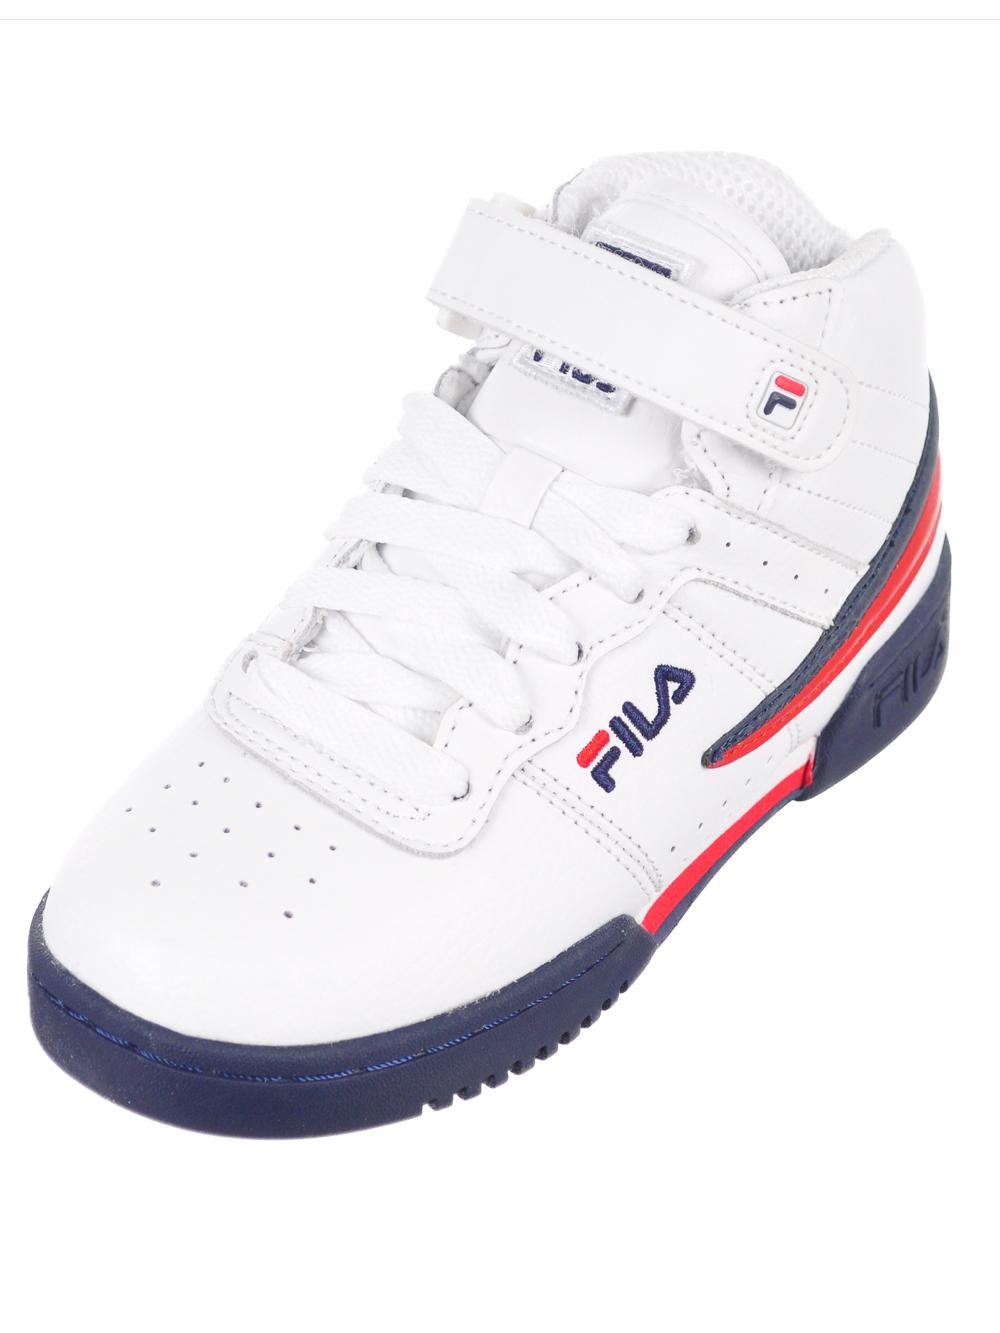 Fila Boys' F 13 Hi Top Sneakers (Sizes 10.5 – 4)